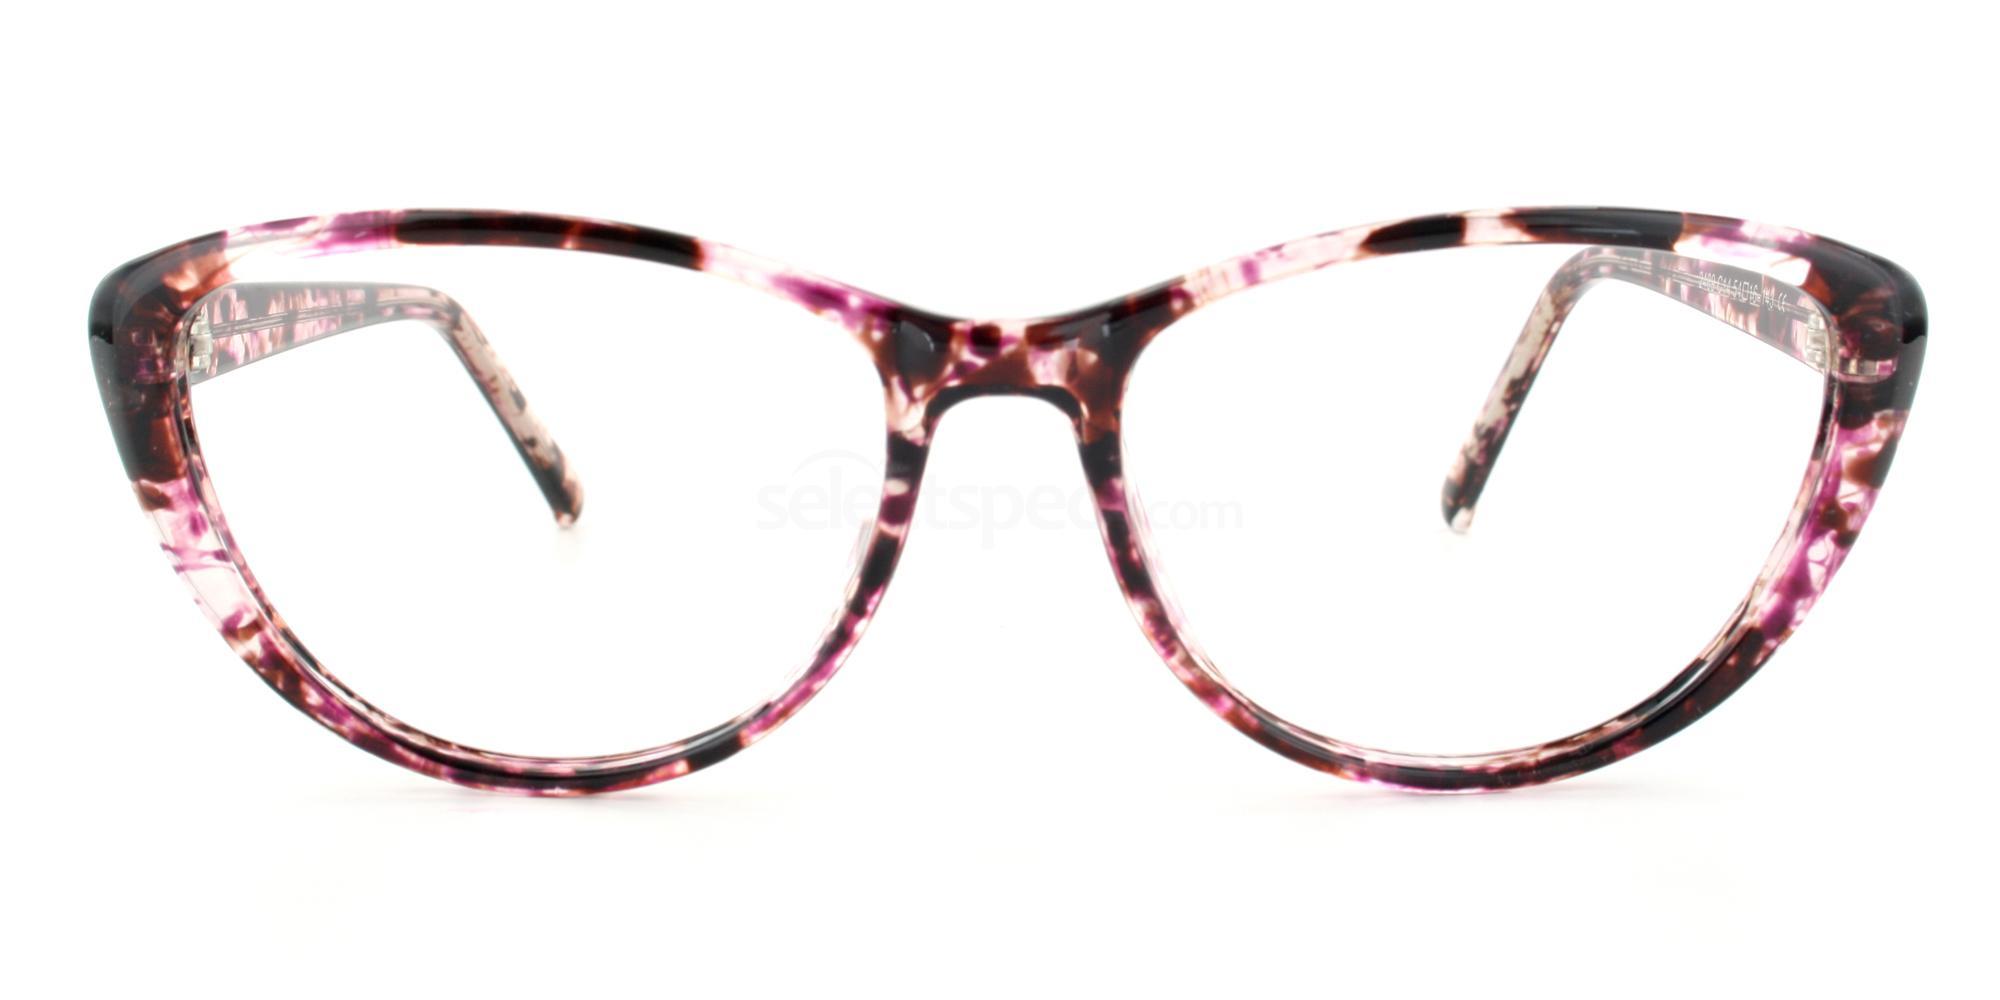 C15 2489 - Pink Demi Glasses, Savannah